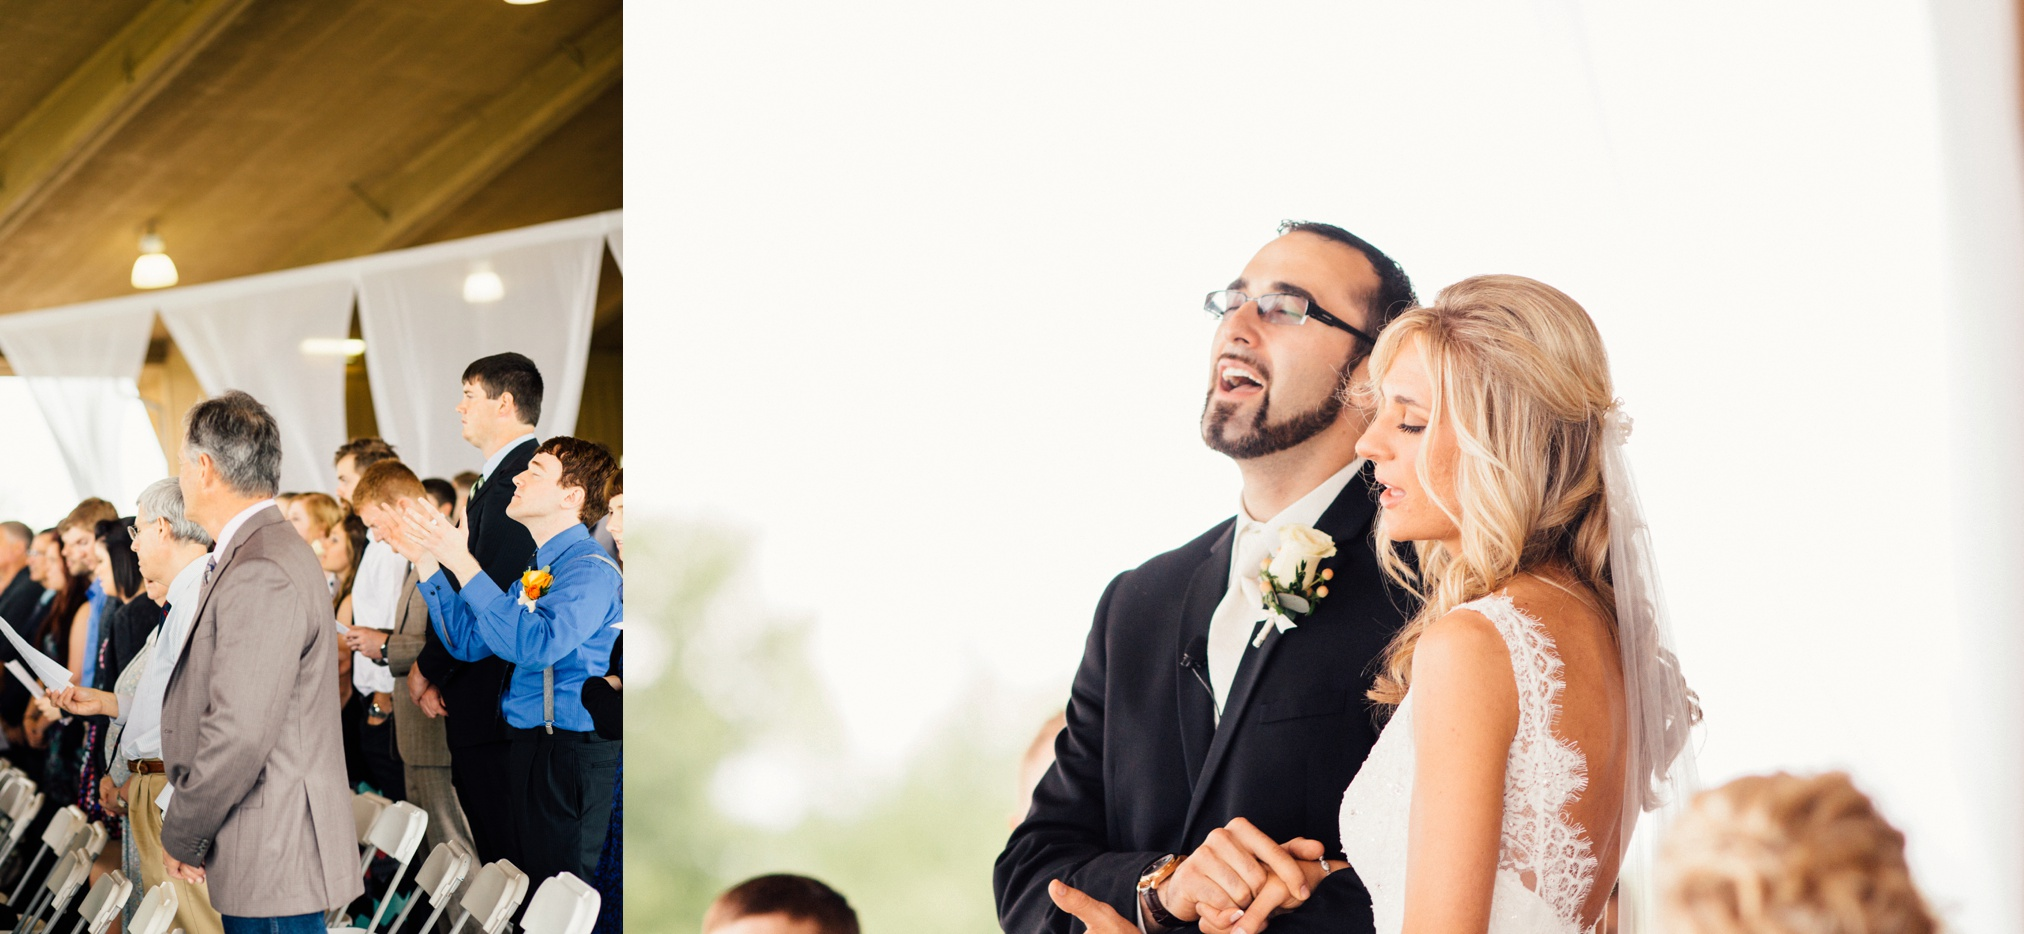 schmid_wedding-428.jpg